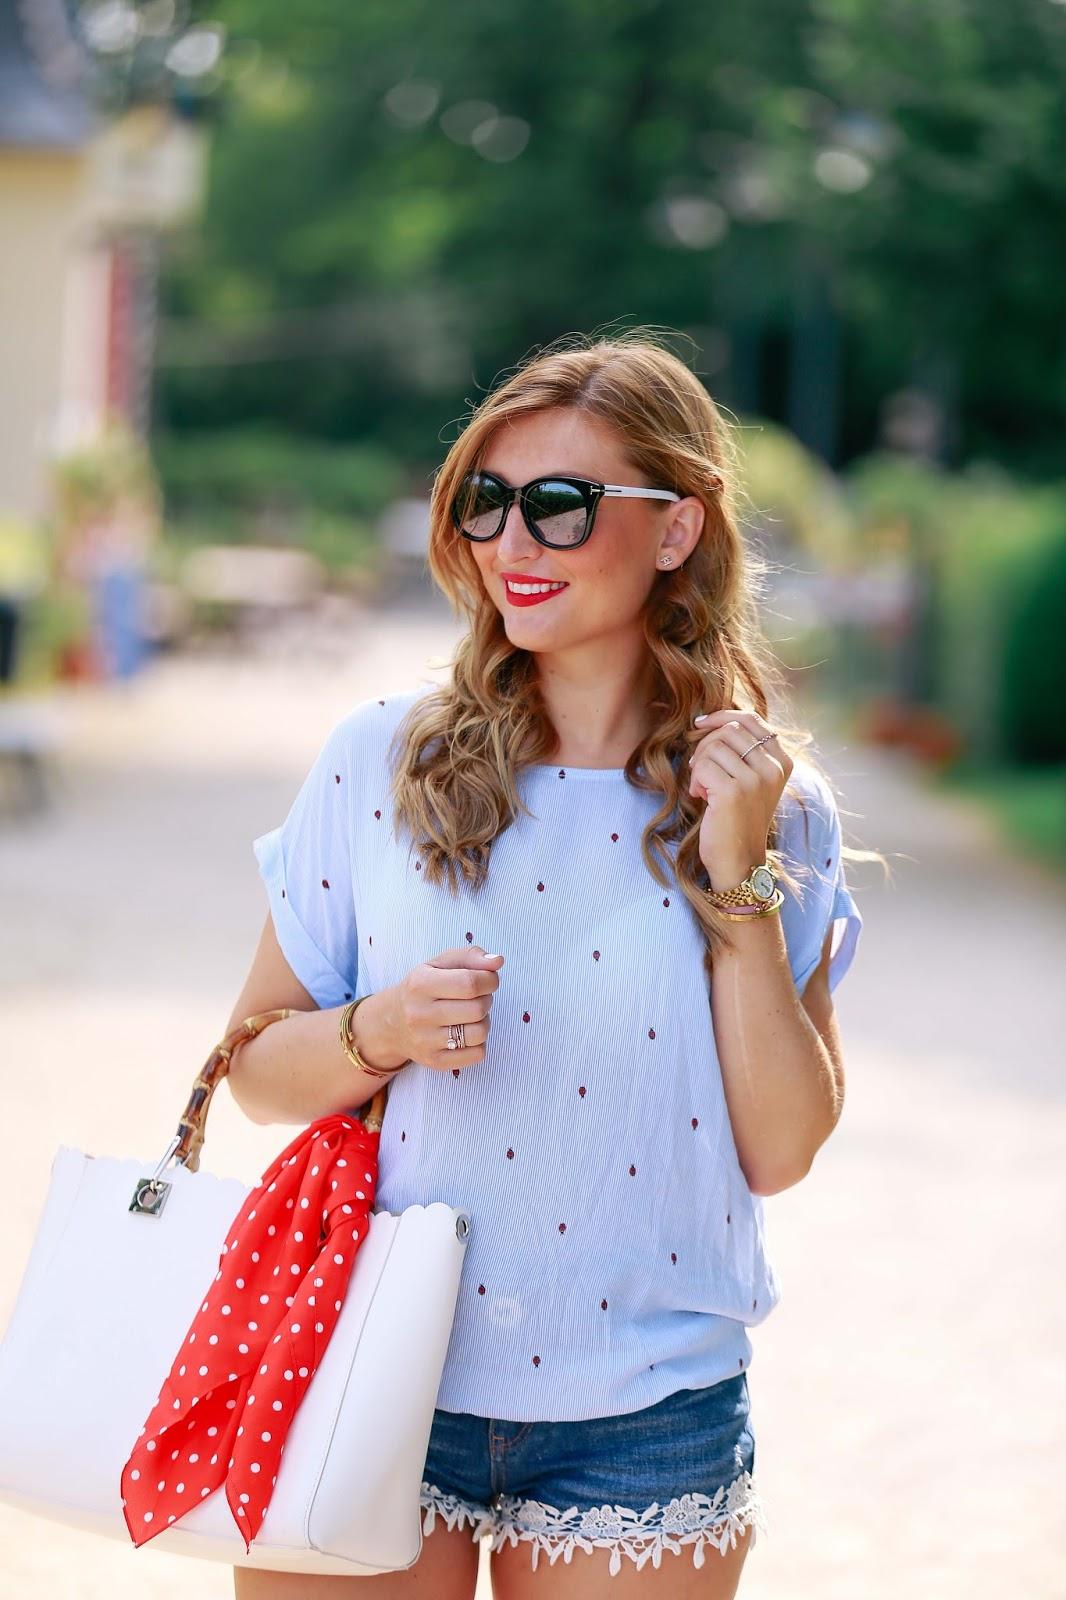 Fashionblogger-aus-deutsc hland.fashionstylebyjohanna-sommerlook